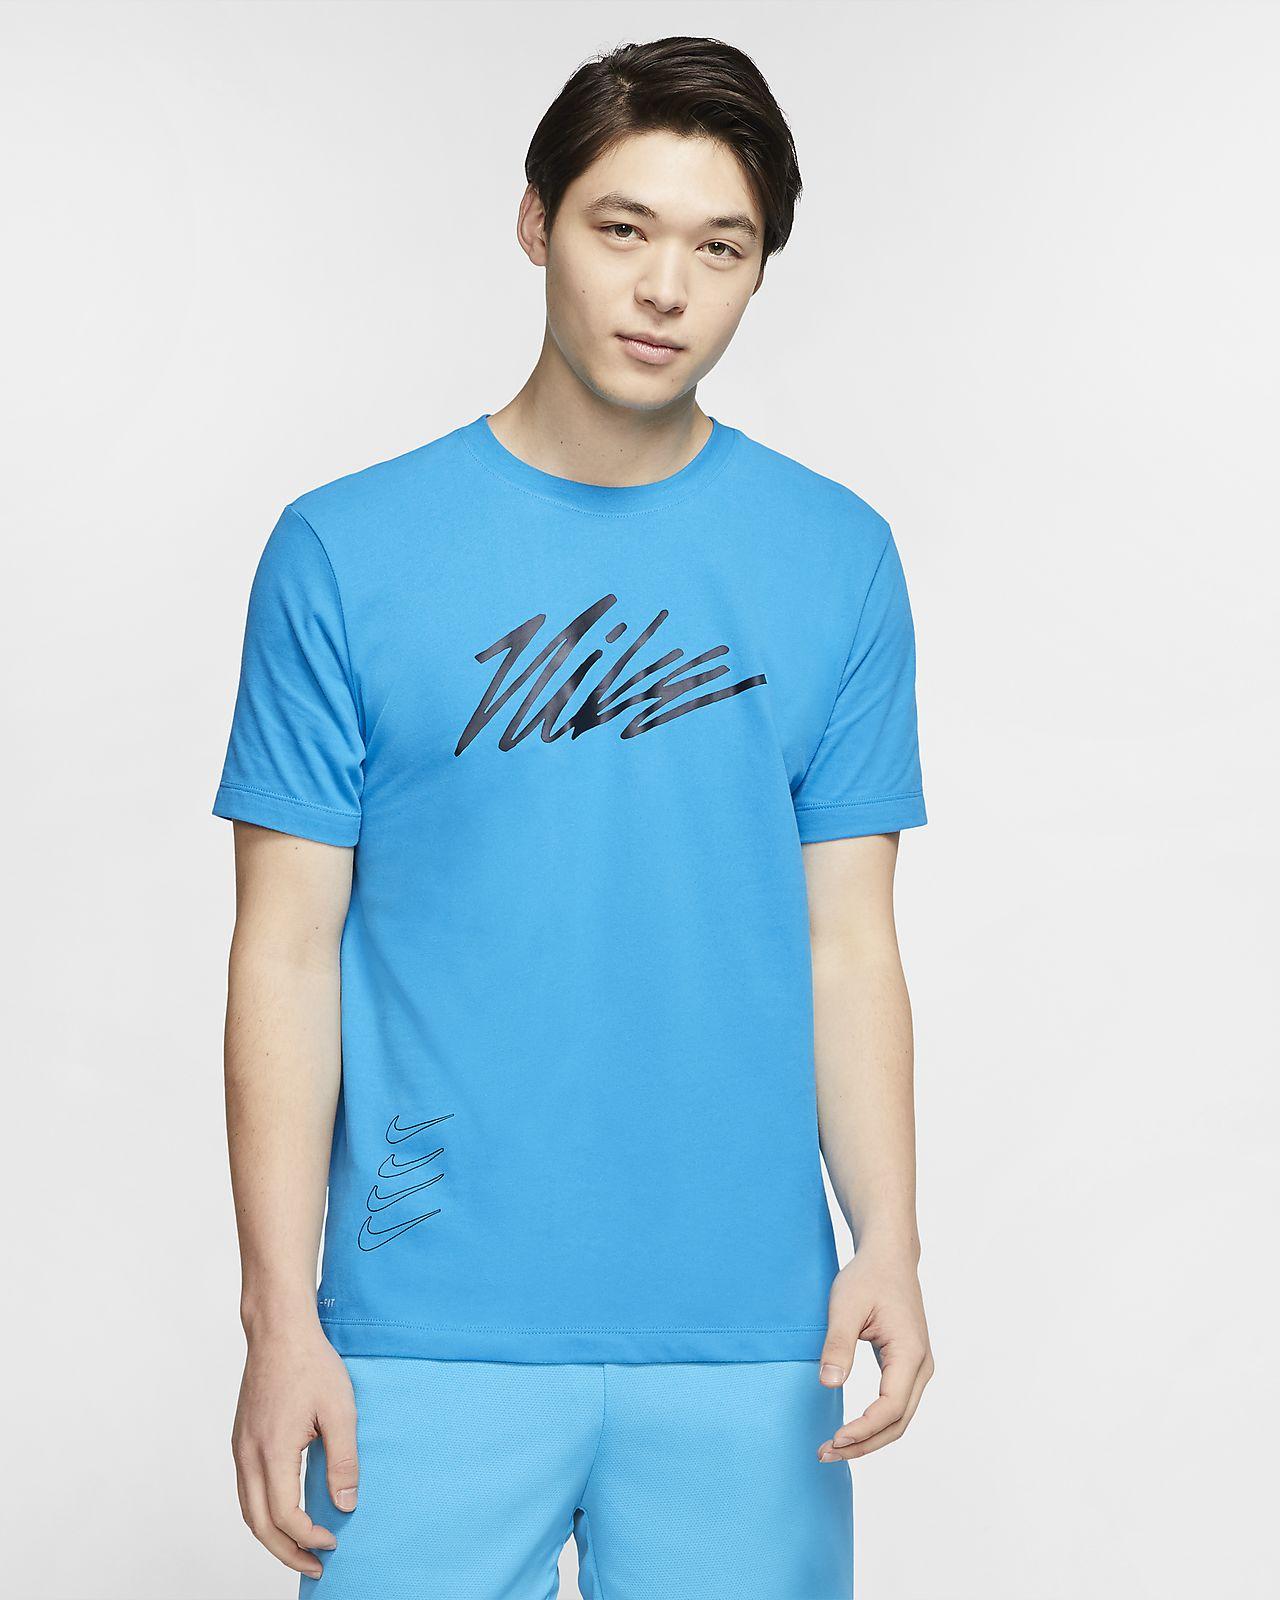 Nike Dri-FIT Trainings-T-Shirt mit Grafik für Herren